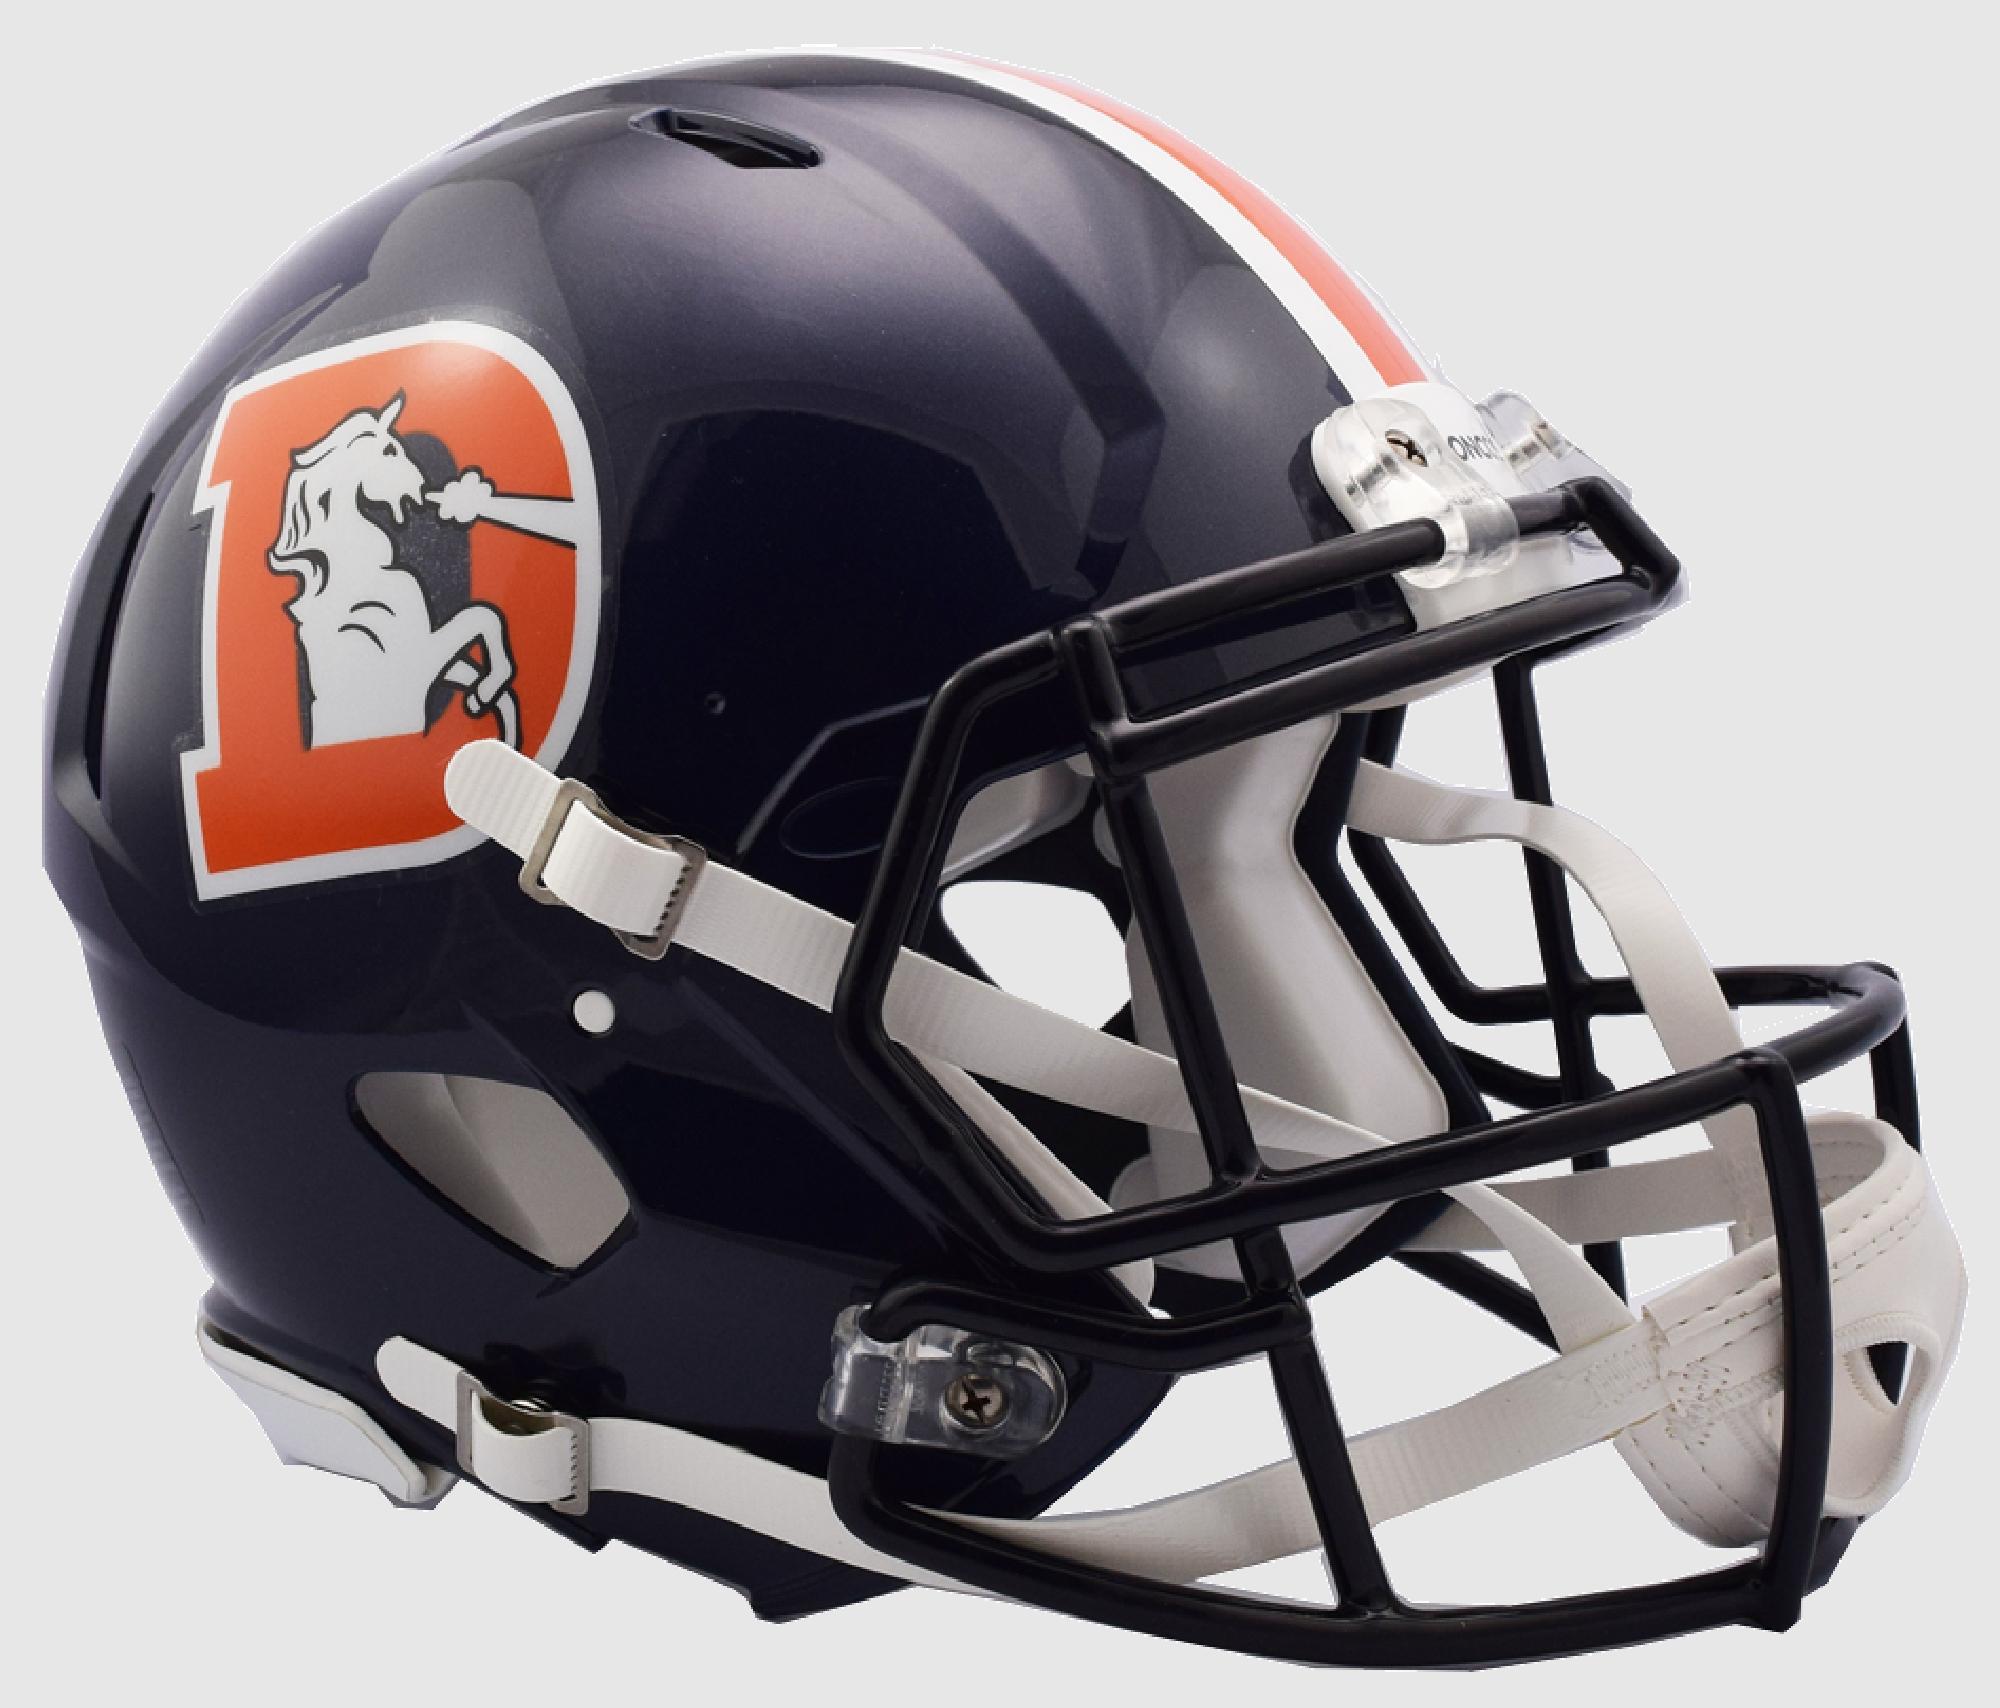 Denver Broncos Color Rush Speed Football Helmet.